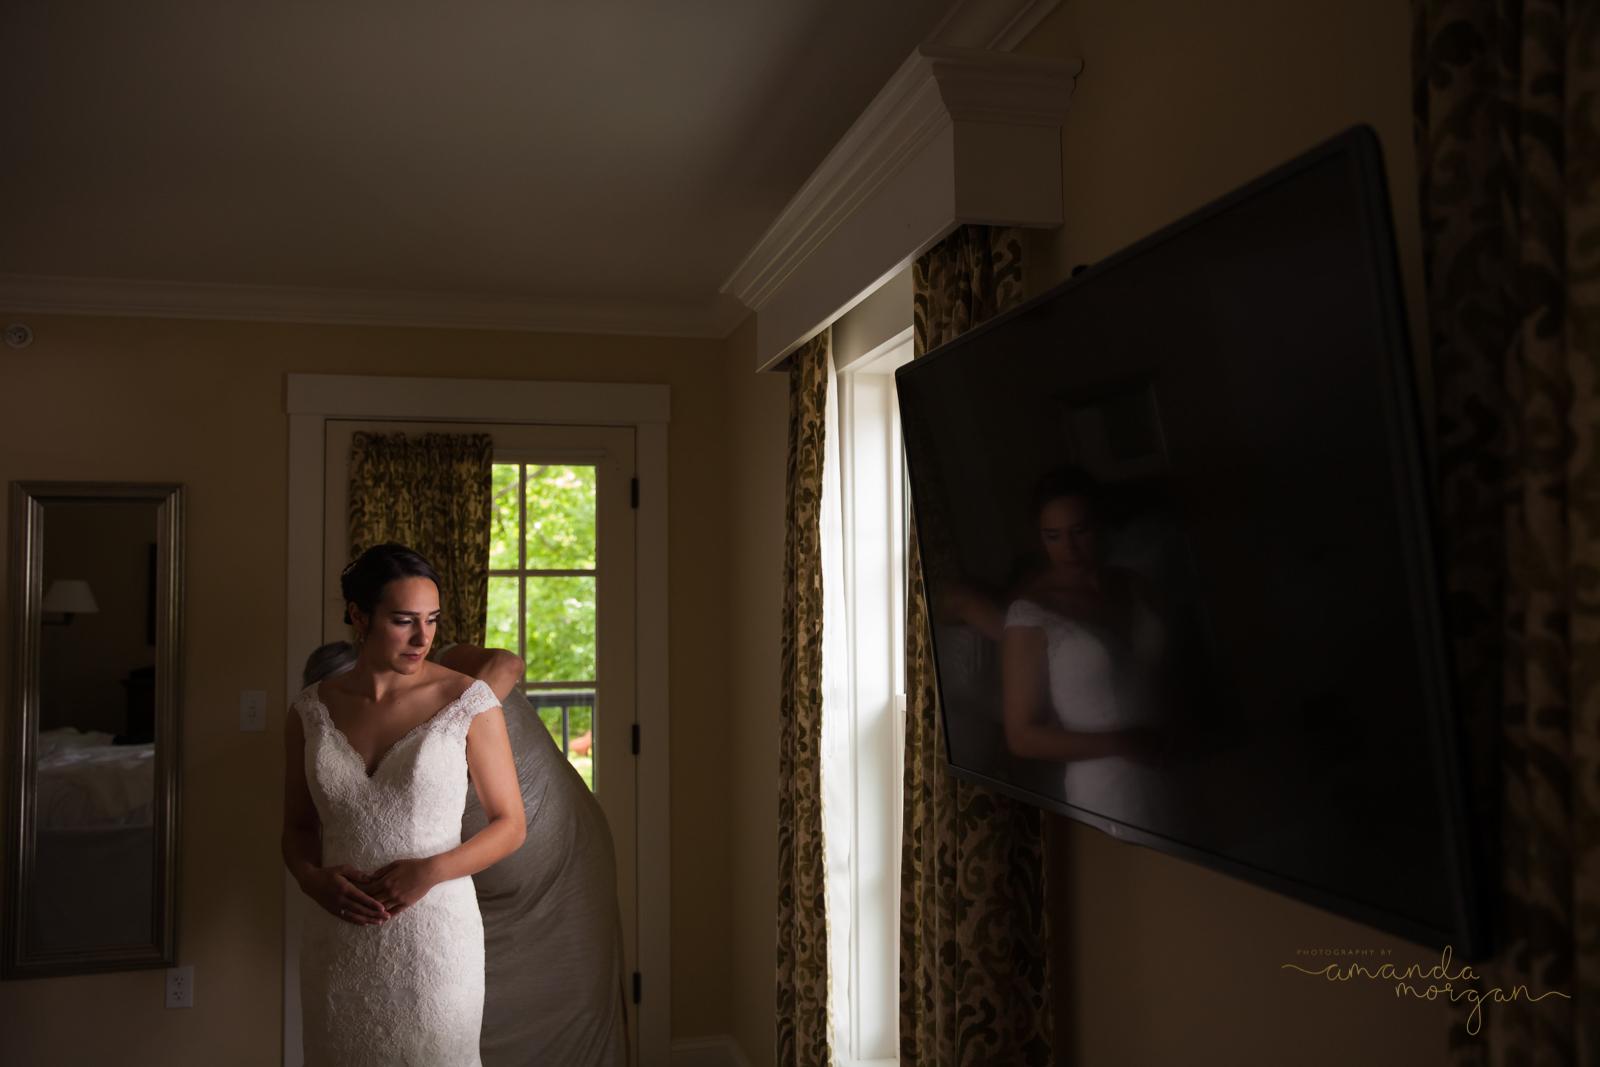 Publick-House-Wedding-Amanda-Morgan-11.jpg